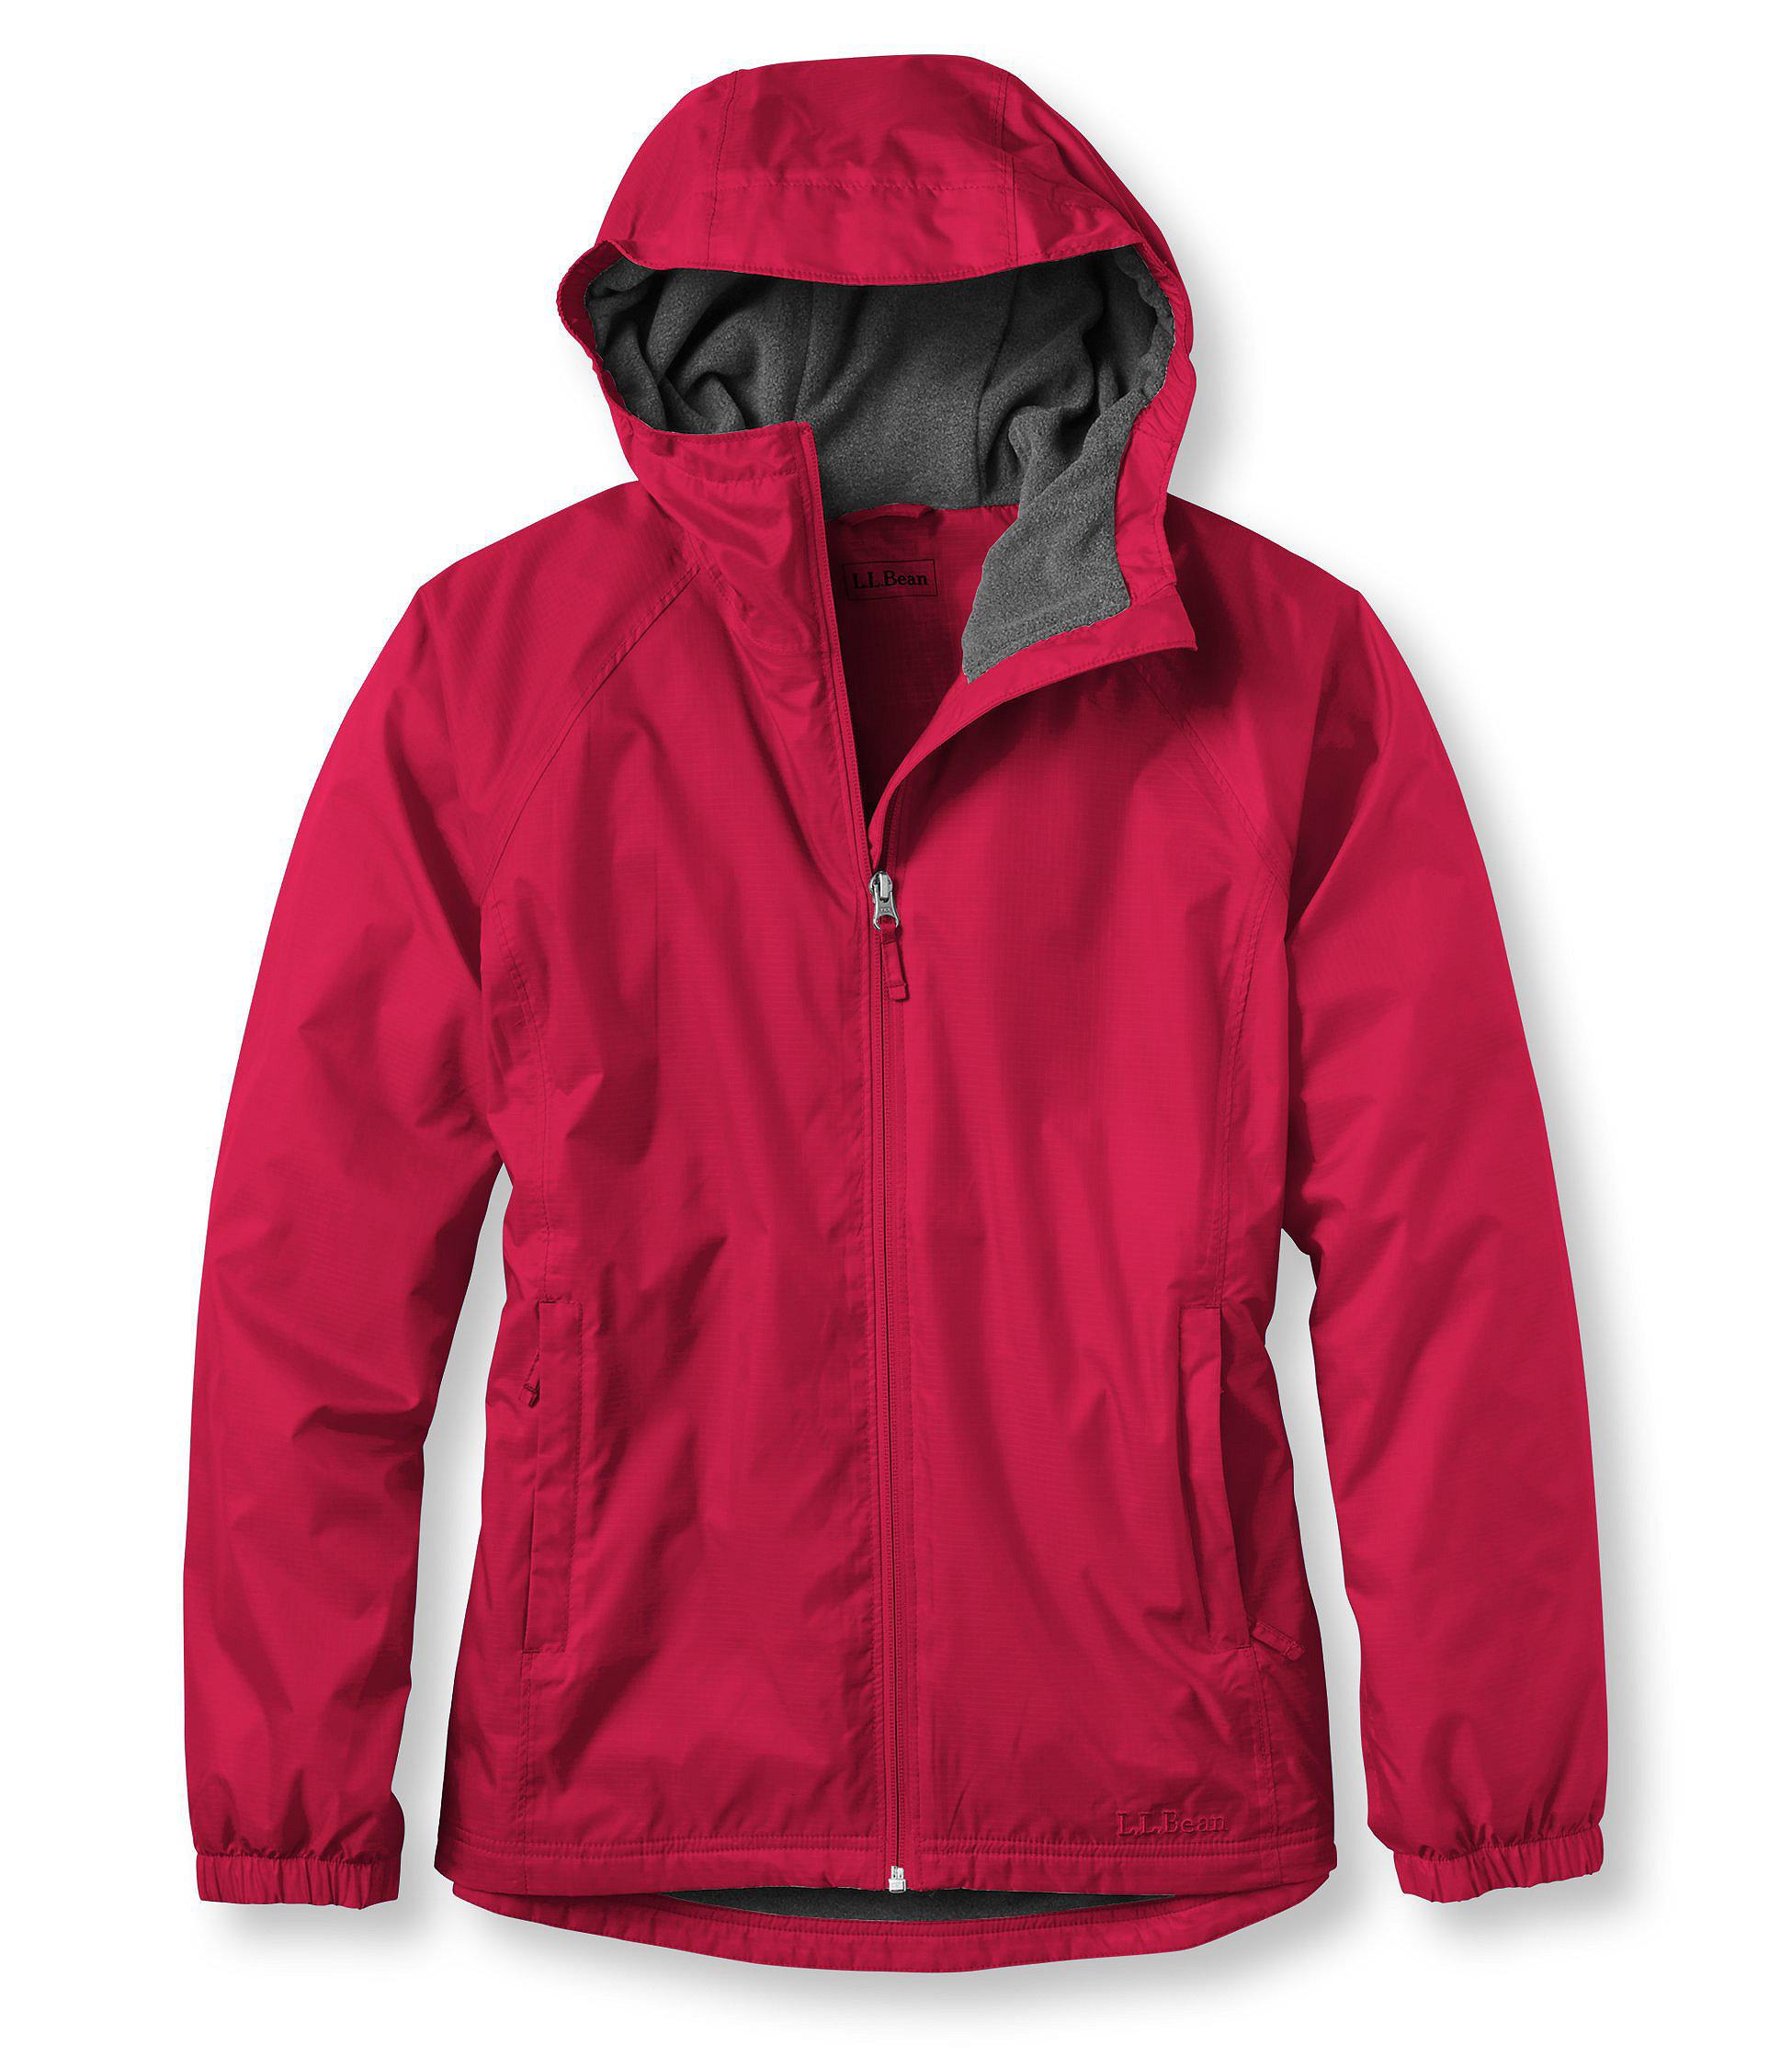 Lined Rain Jackets For Women